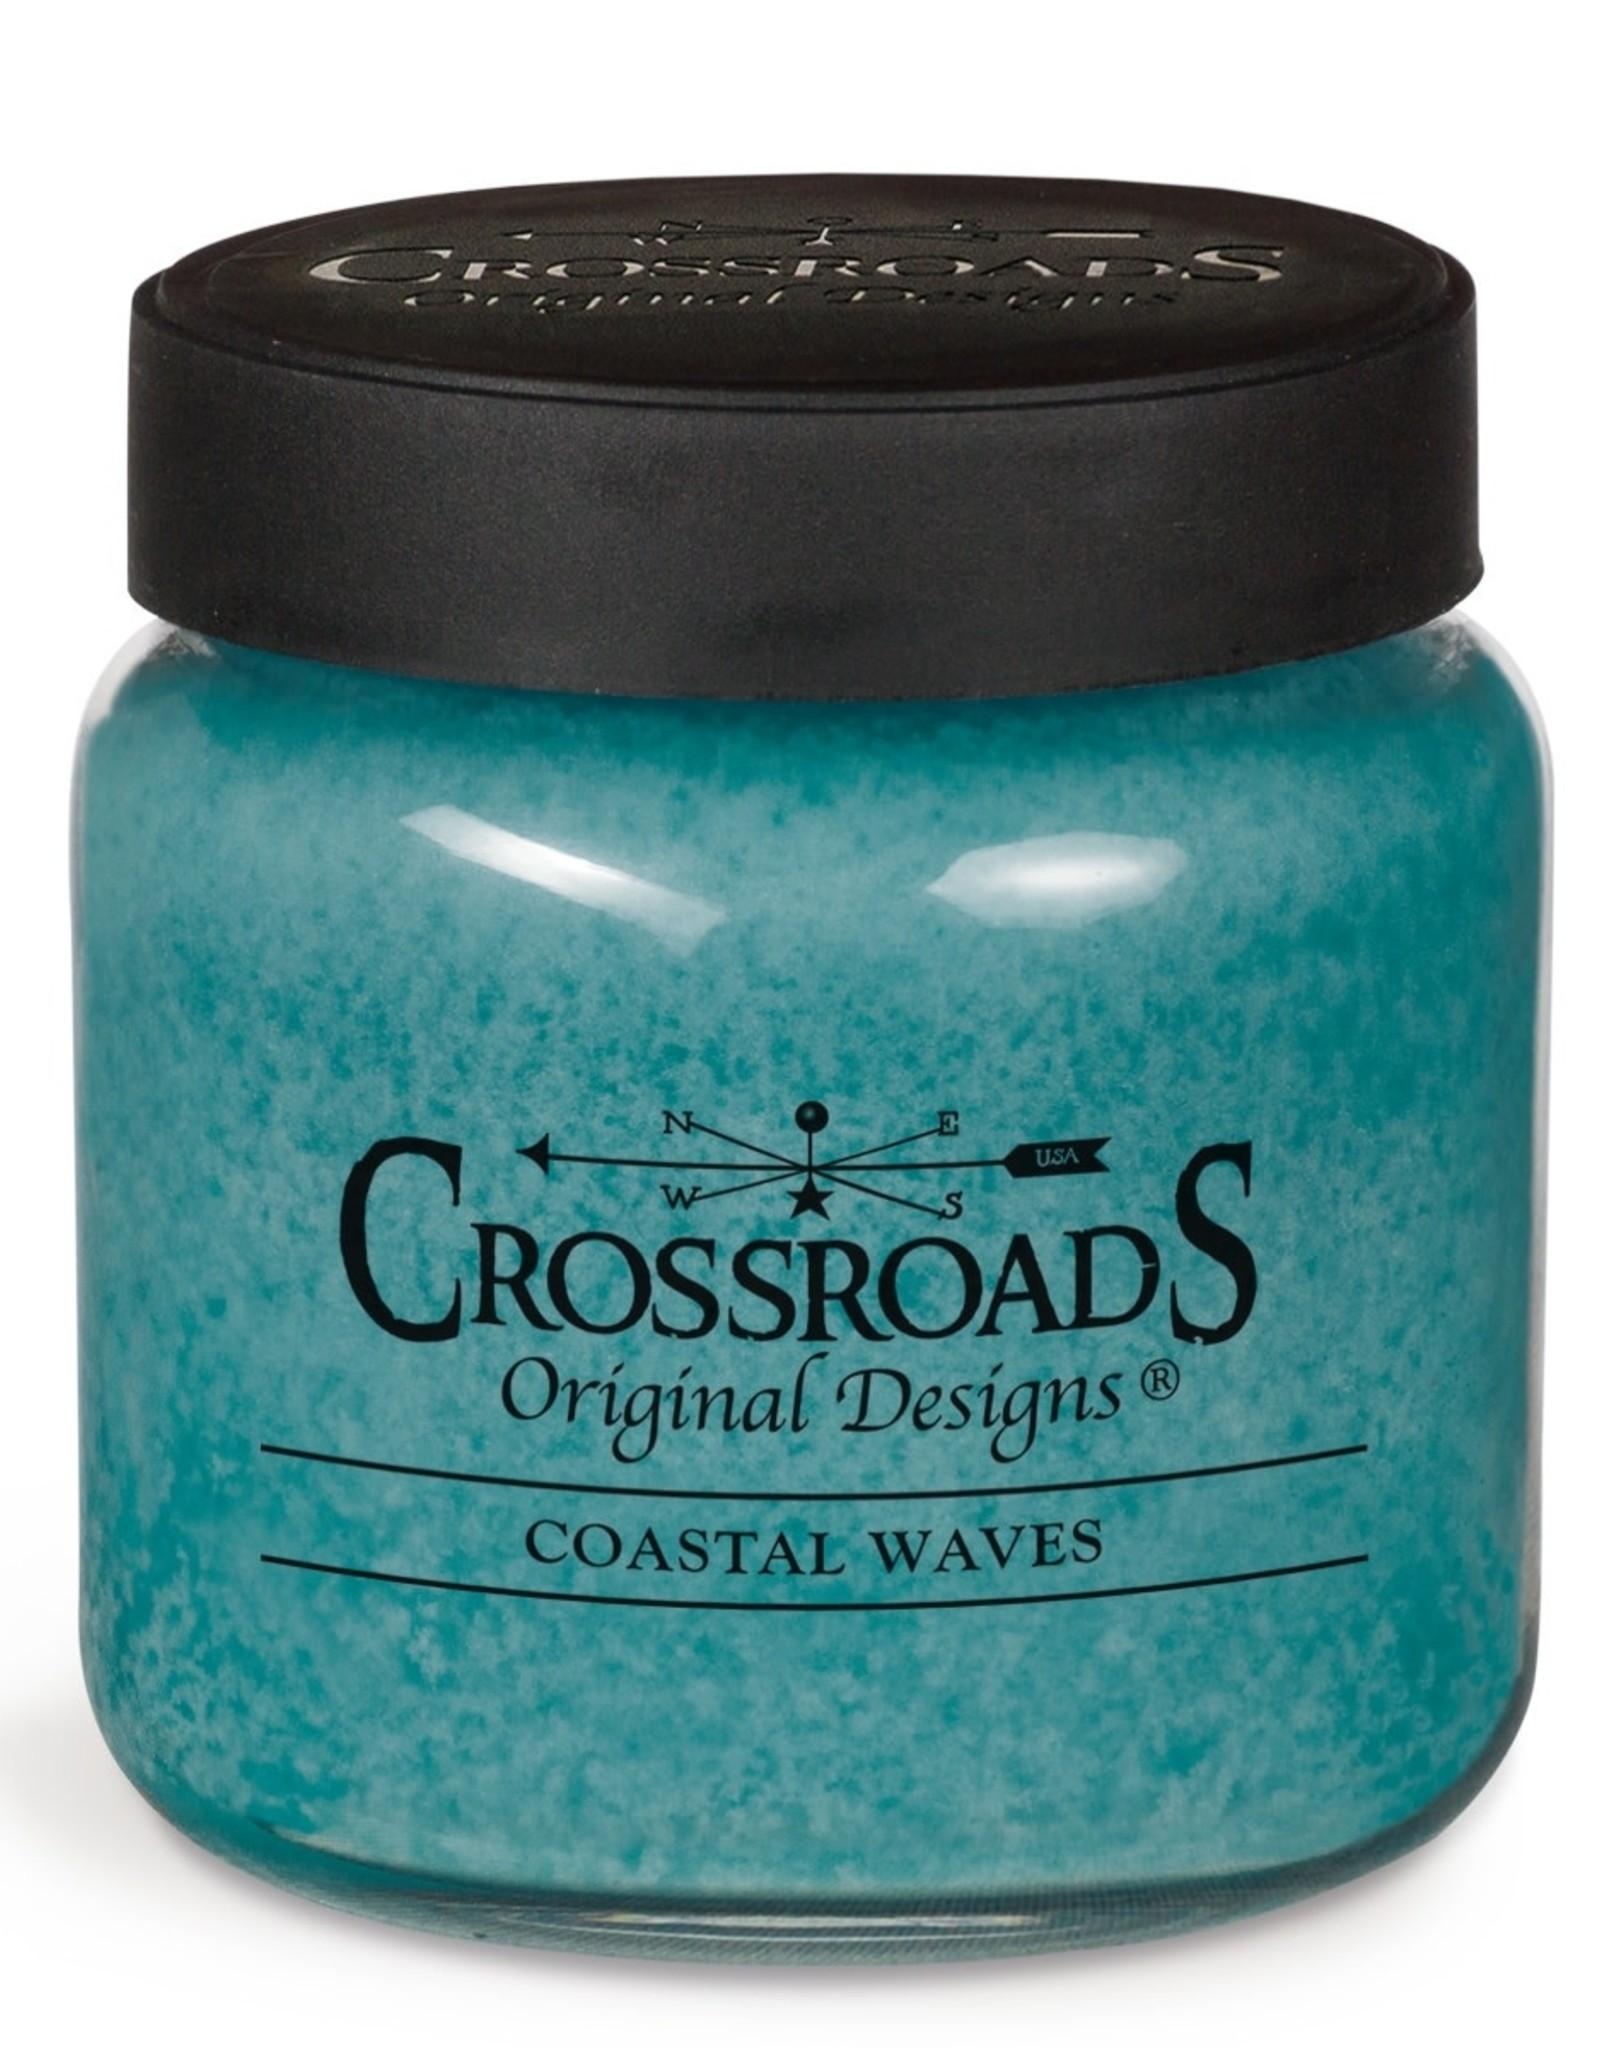 Crossroads Coastal Waves Candle